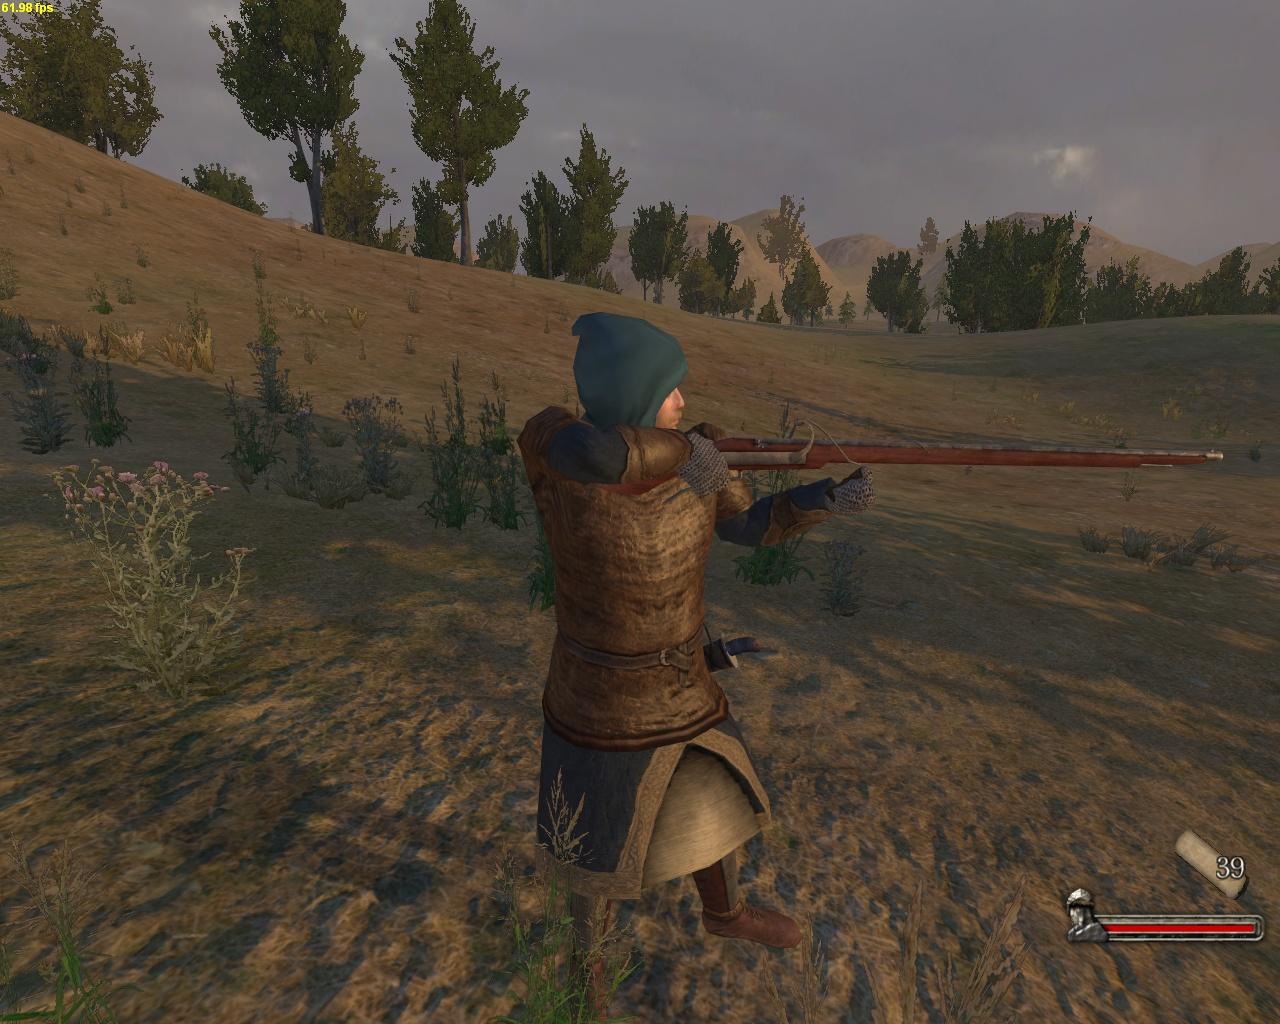 Mount and blade mods freelancer работа по фрилансу в самаре